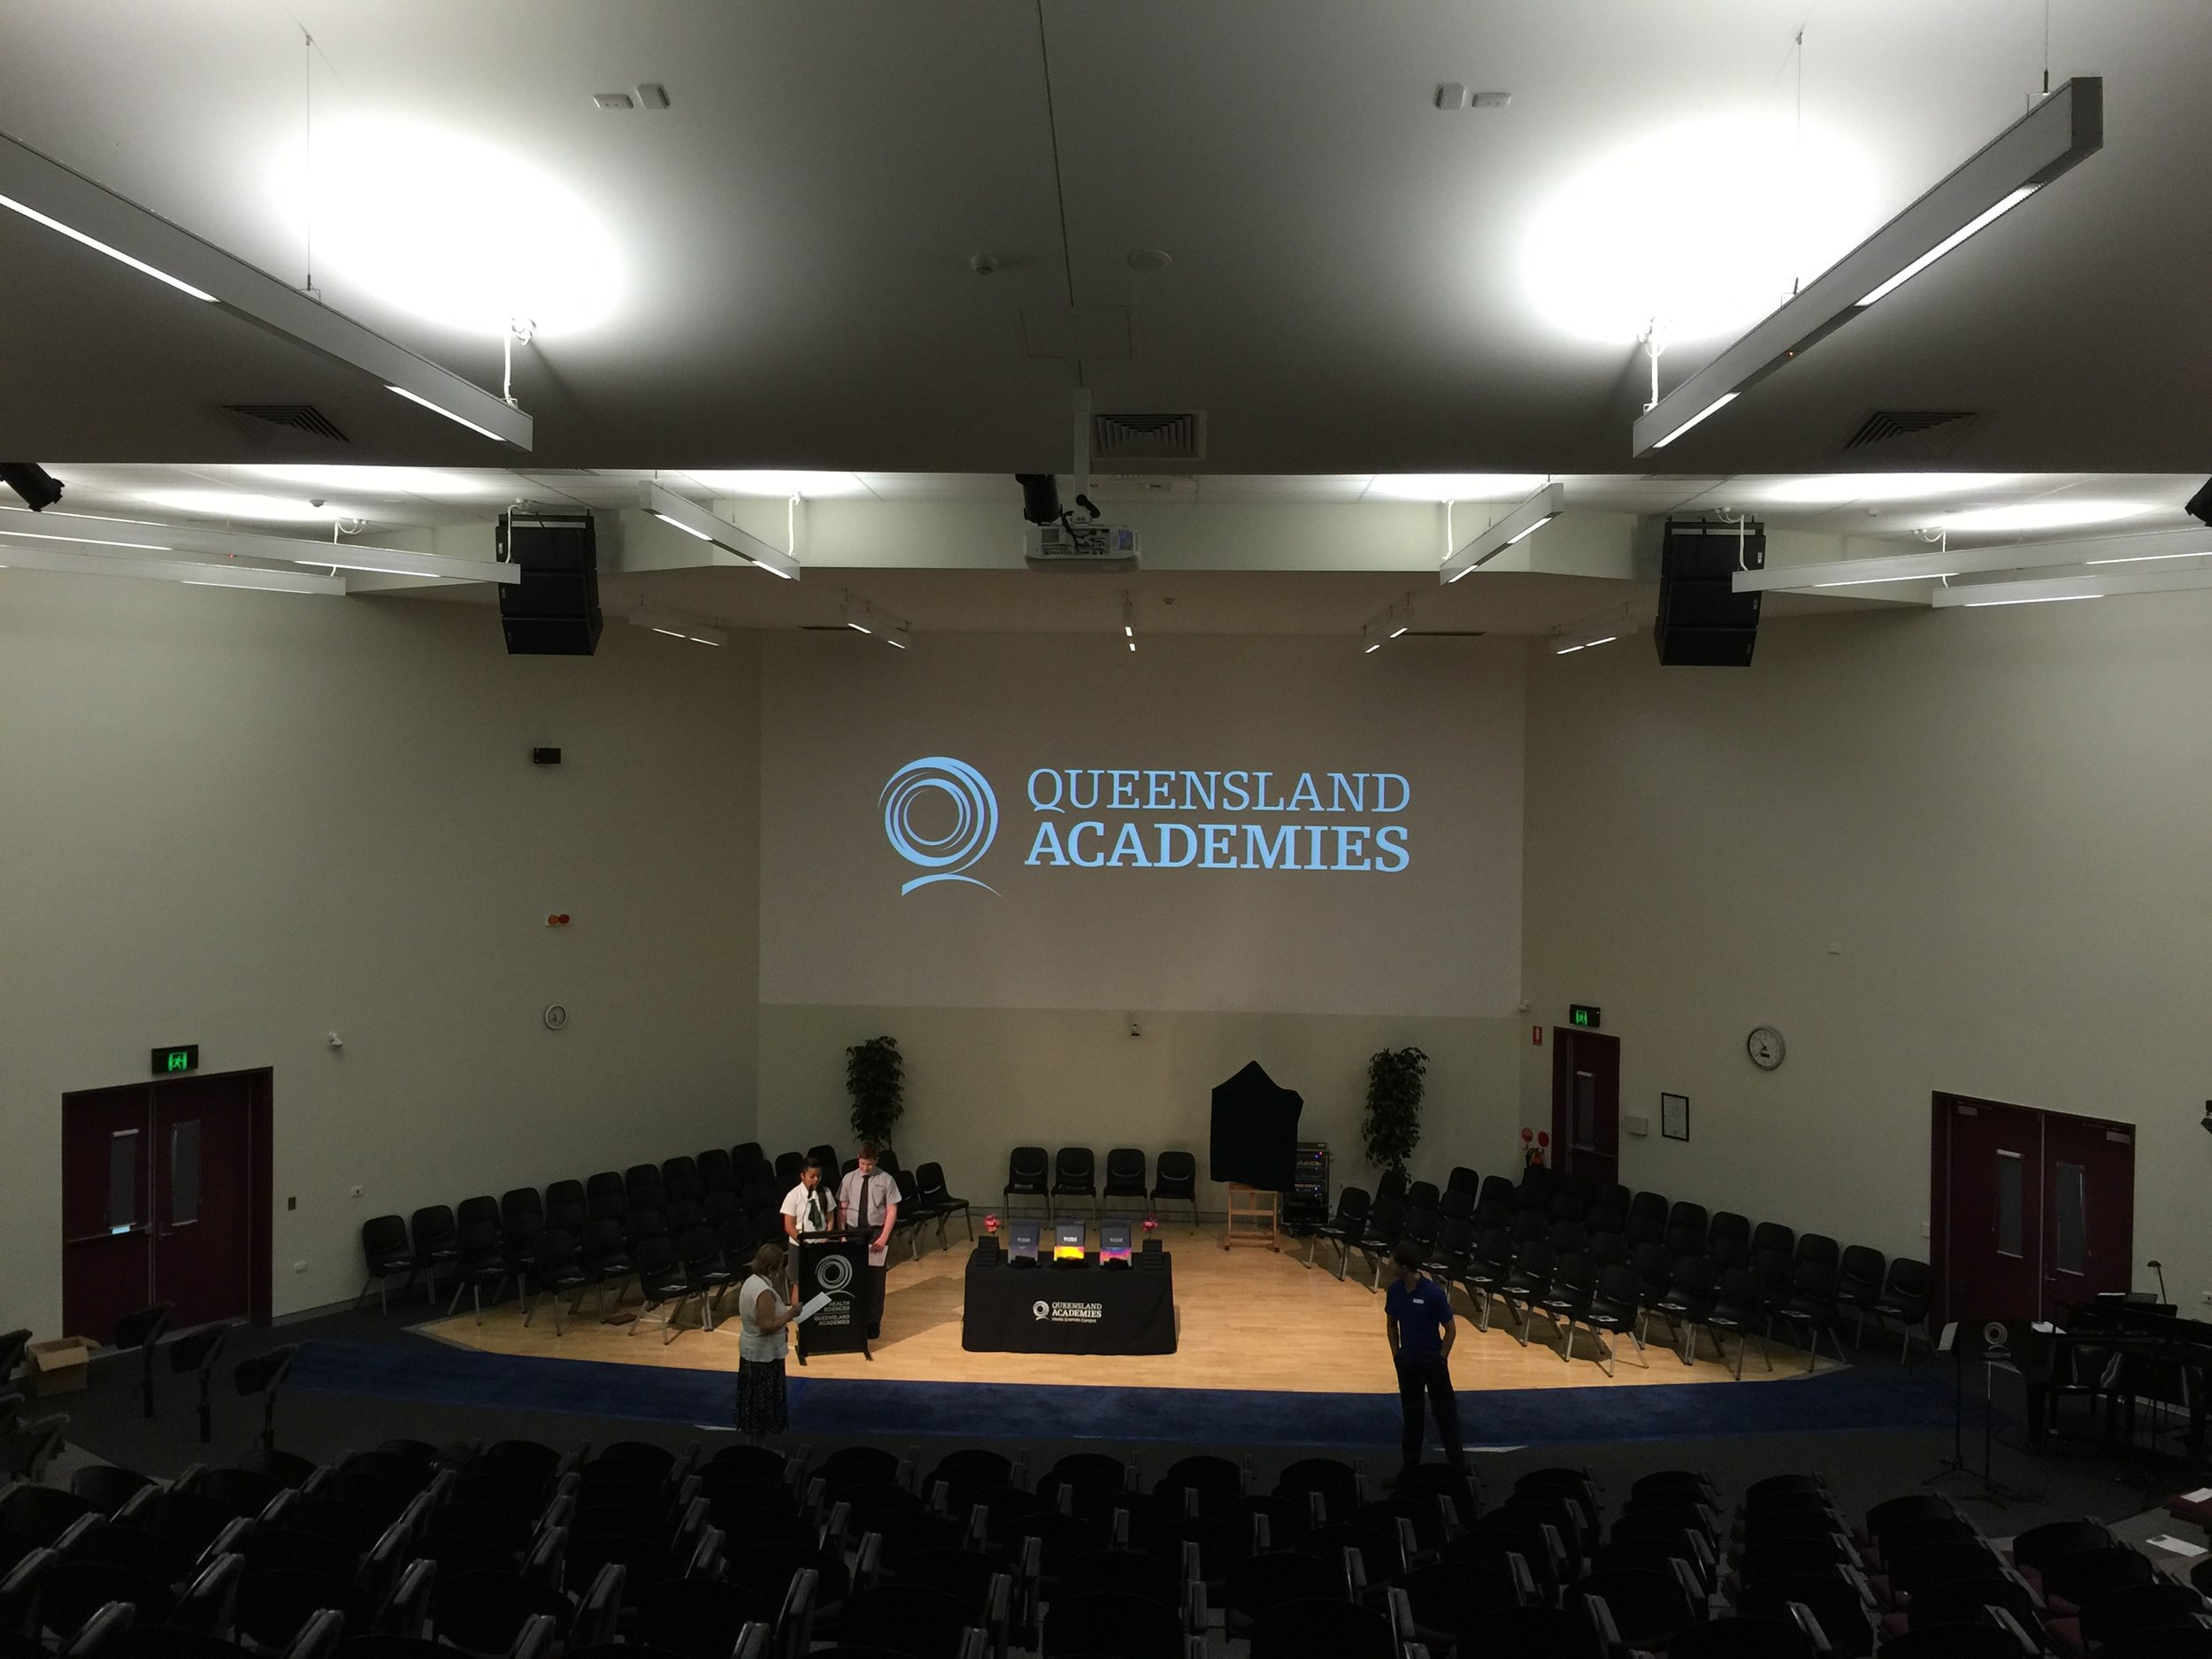 q_academies.JPG